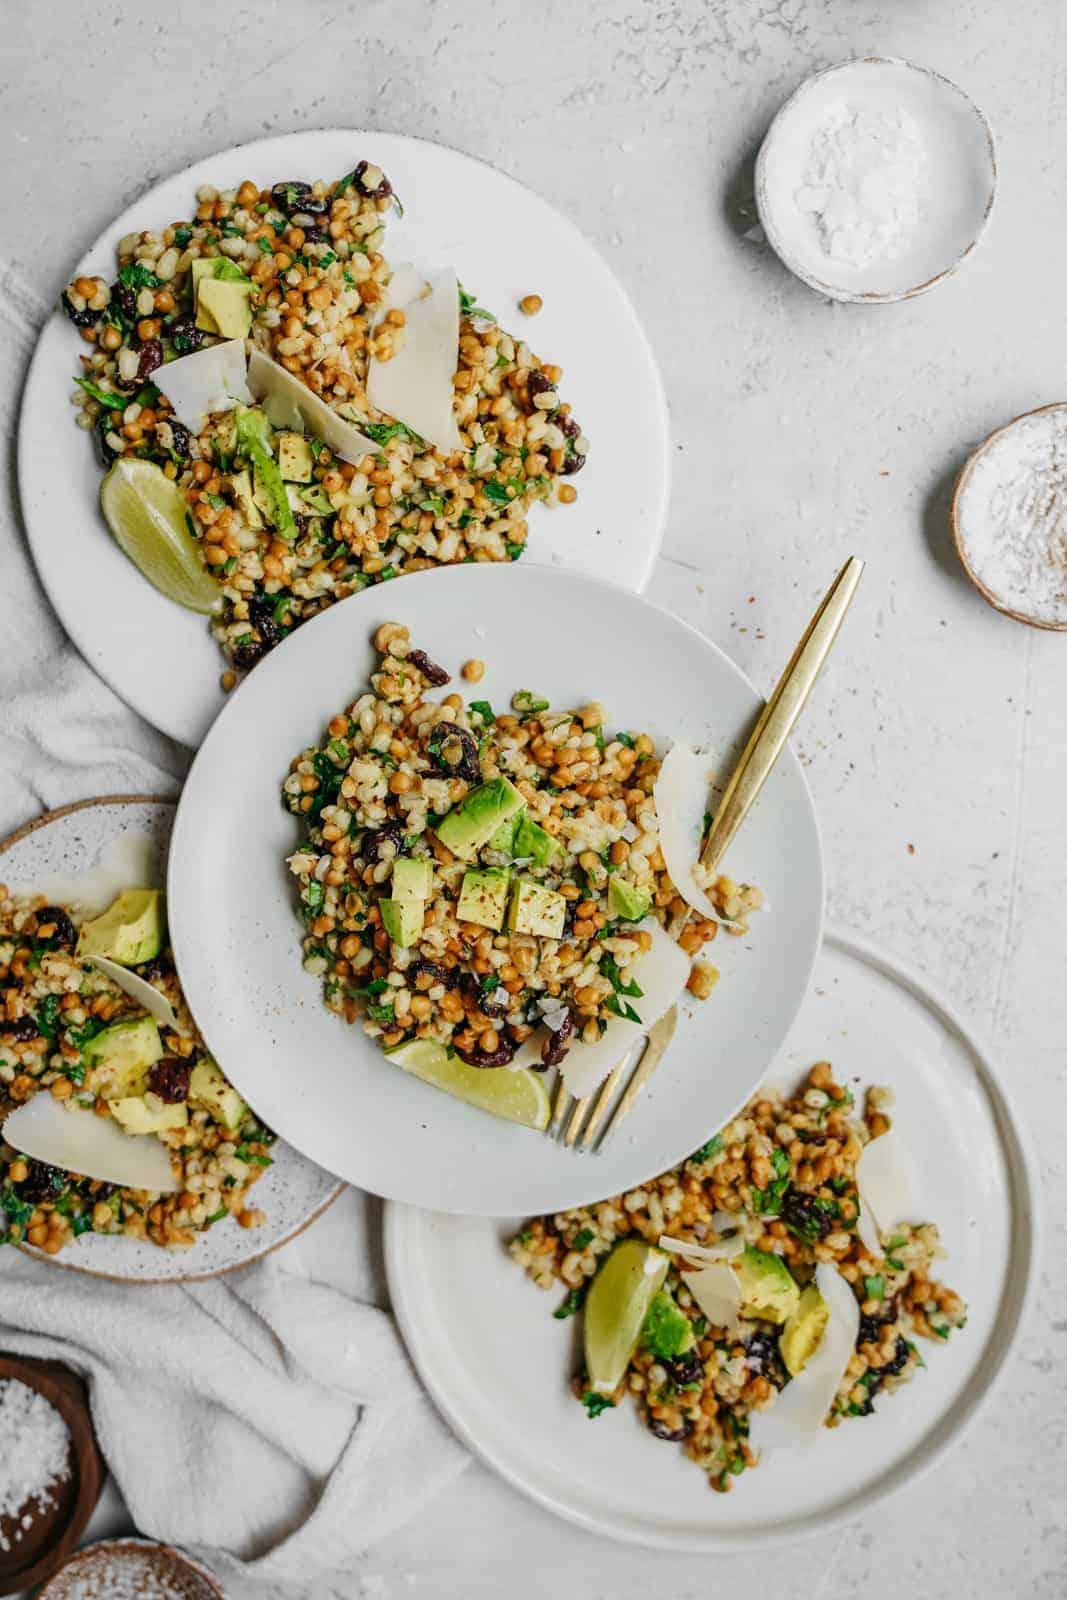 Simple Vegan Salad